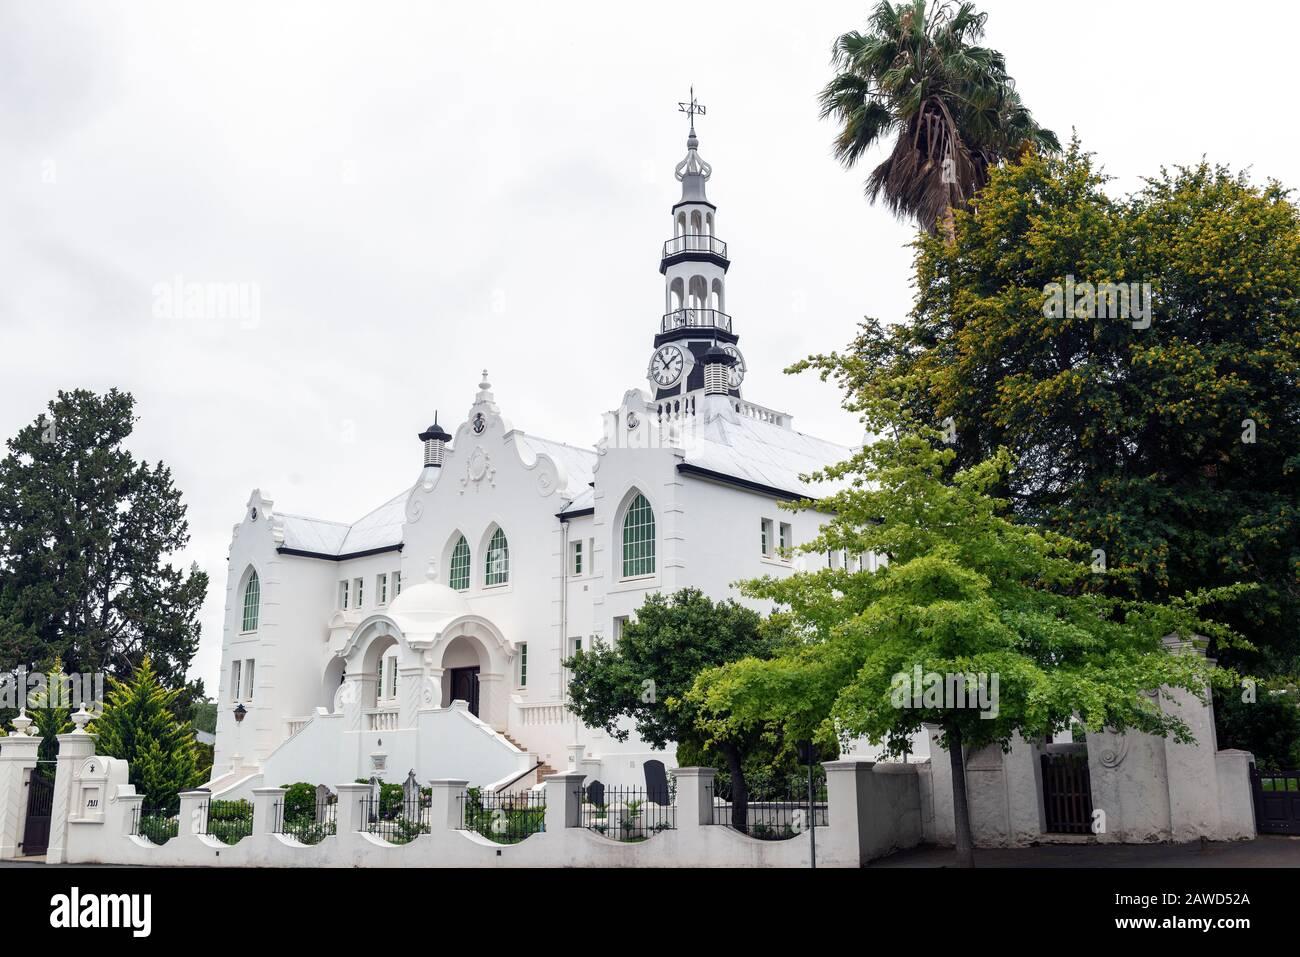 Dutch Reformed Church, Swellendam, Western Cape, South Africa Stock Photo